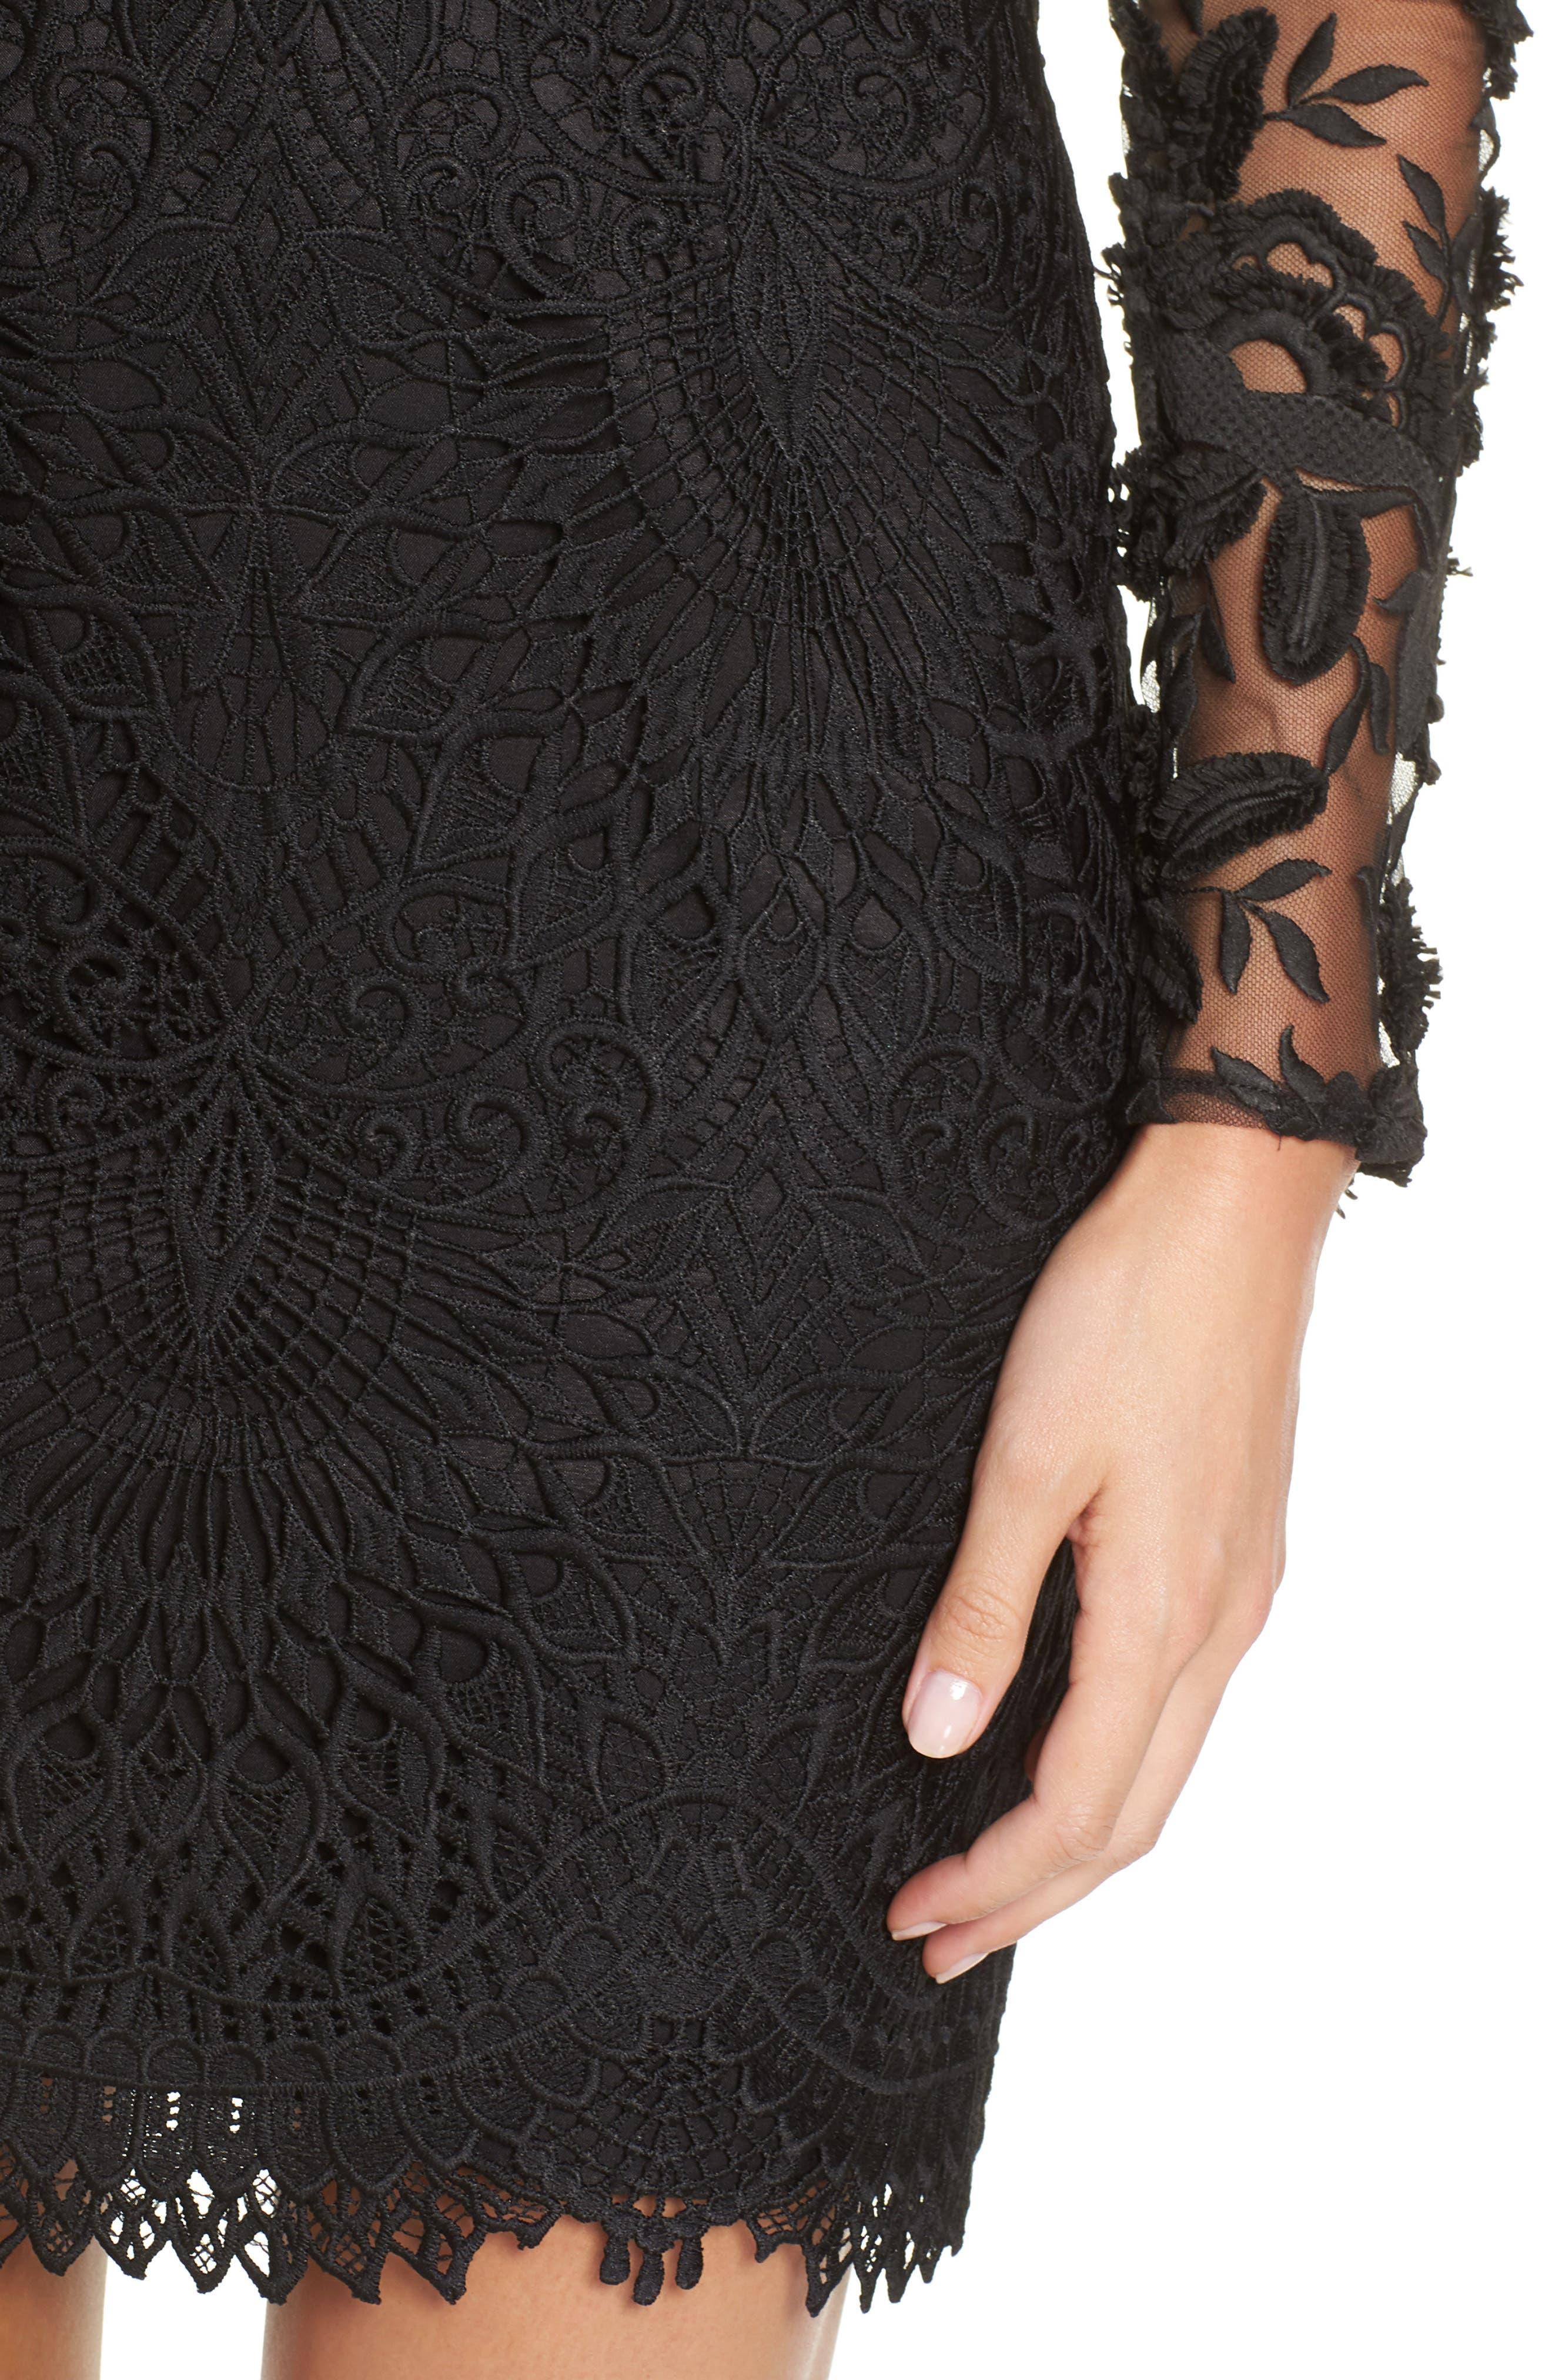 Calypso Lace Sheath Dress,                             Alternate thumbnail 4, color,                             BLACK/ NUDE